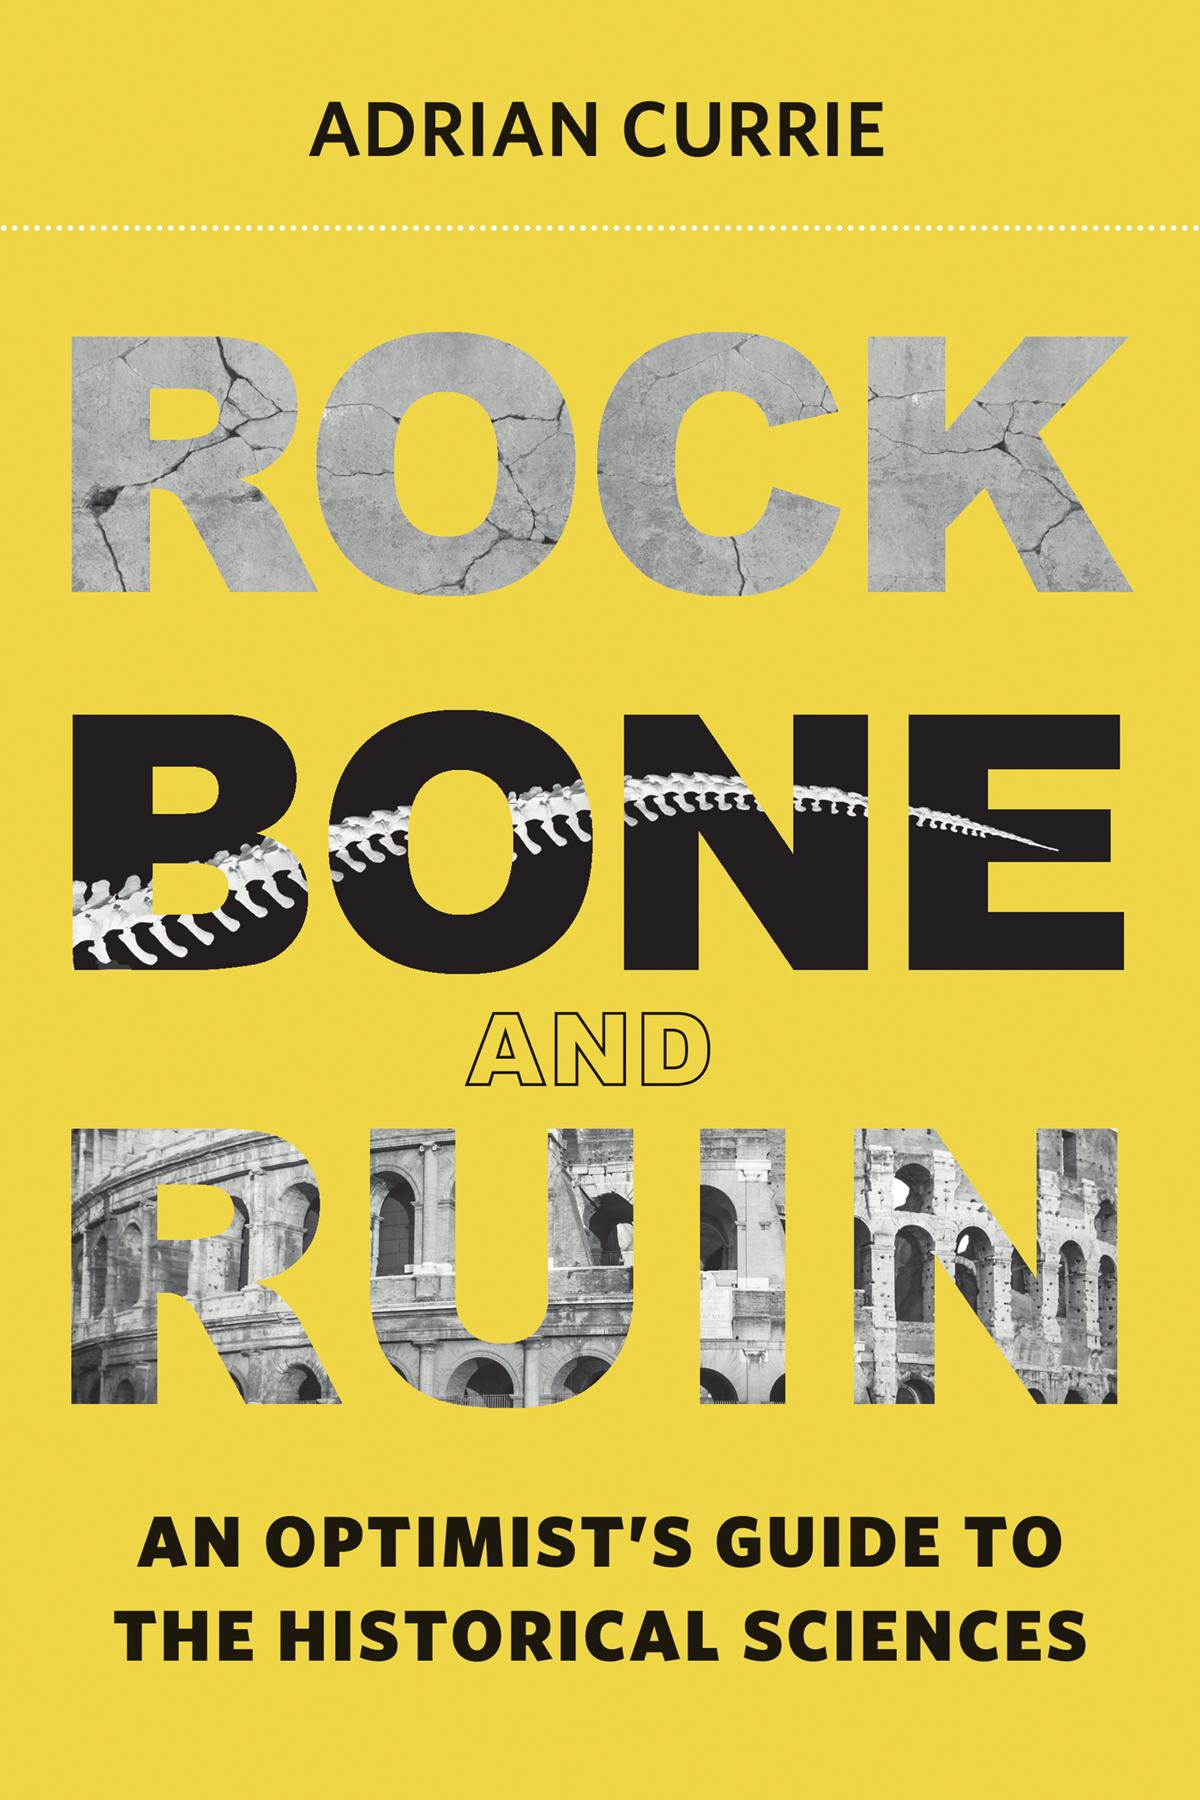 rock-bone-and-ruin